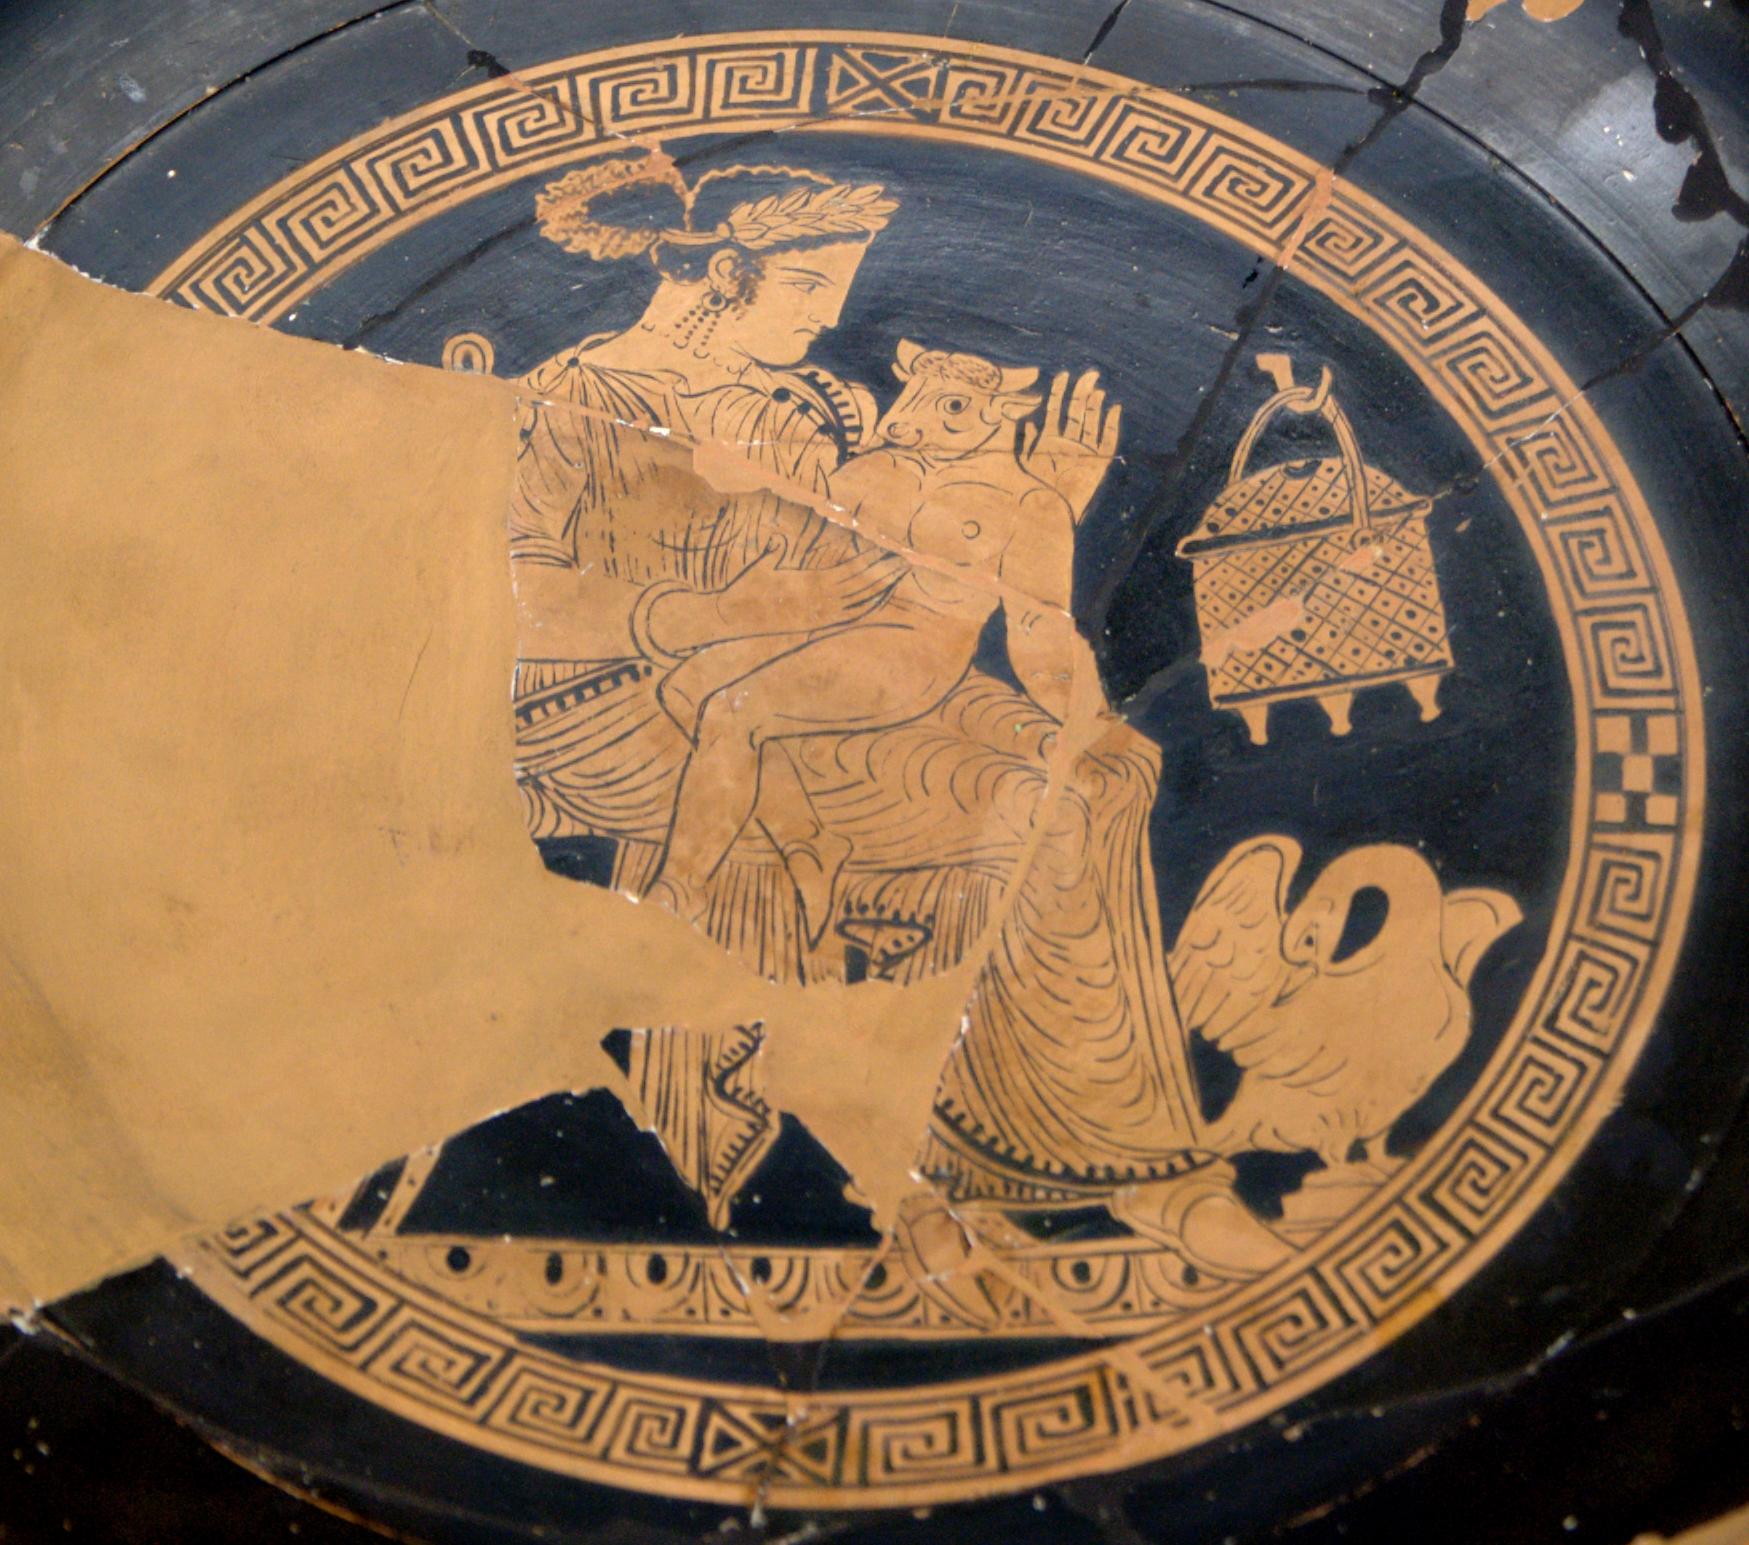 Madeline Miller Myths Myth Of The Week The Minotaur